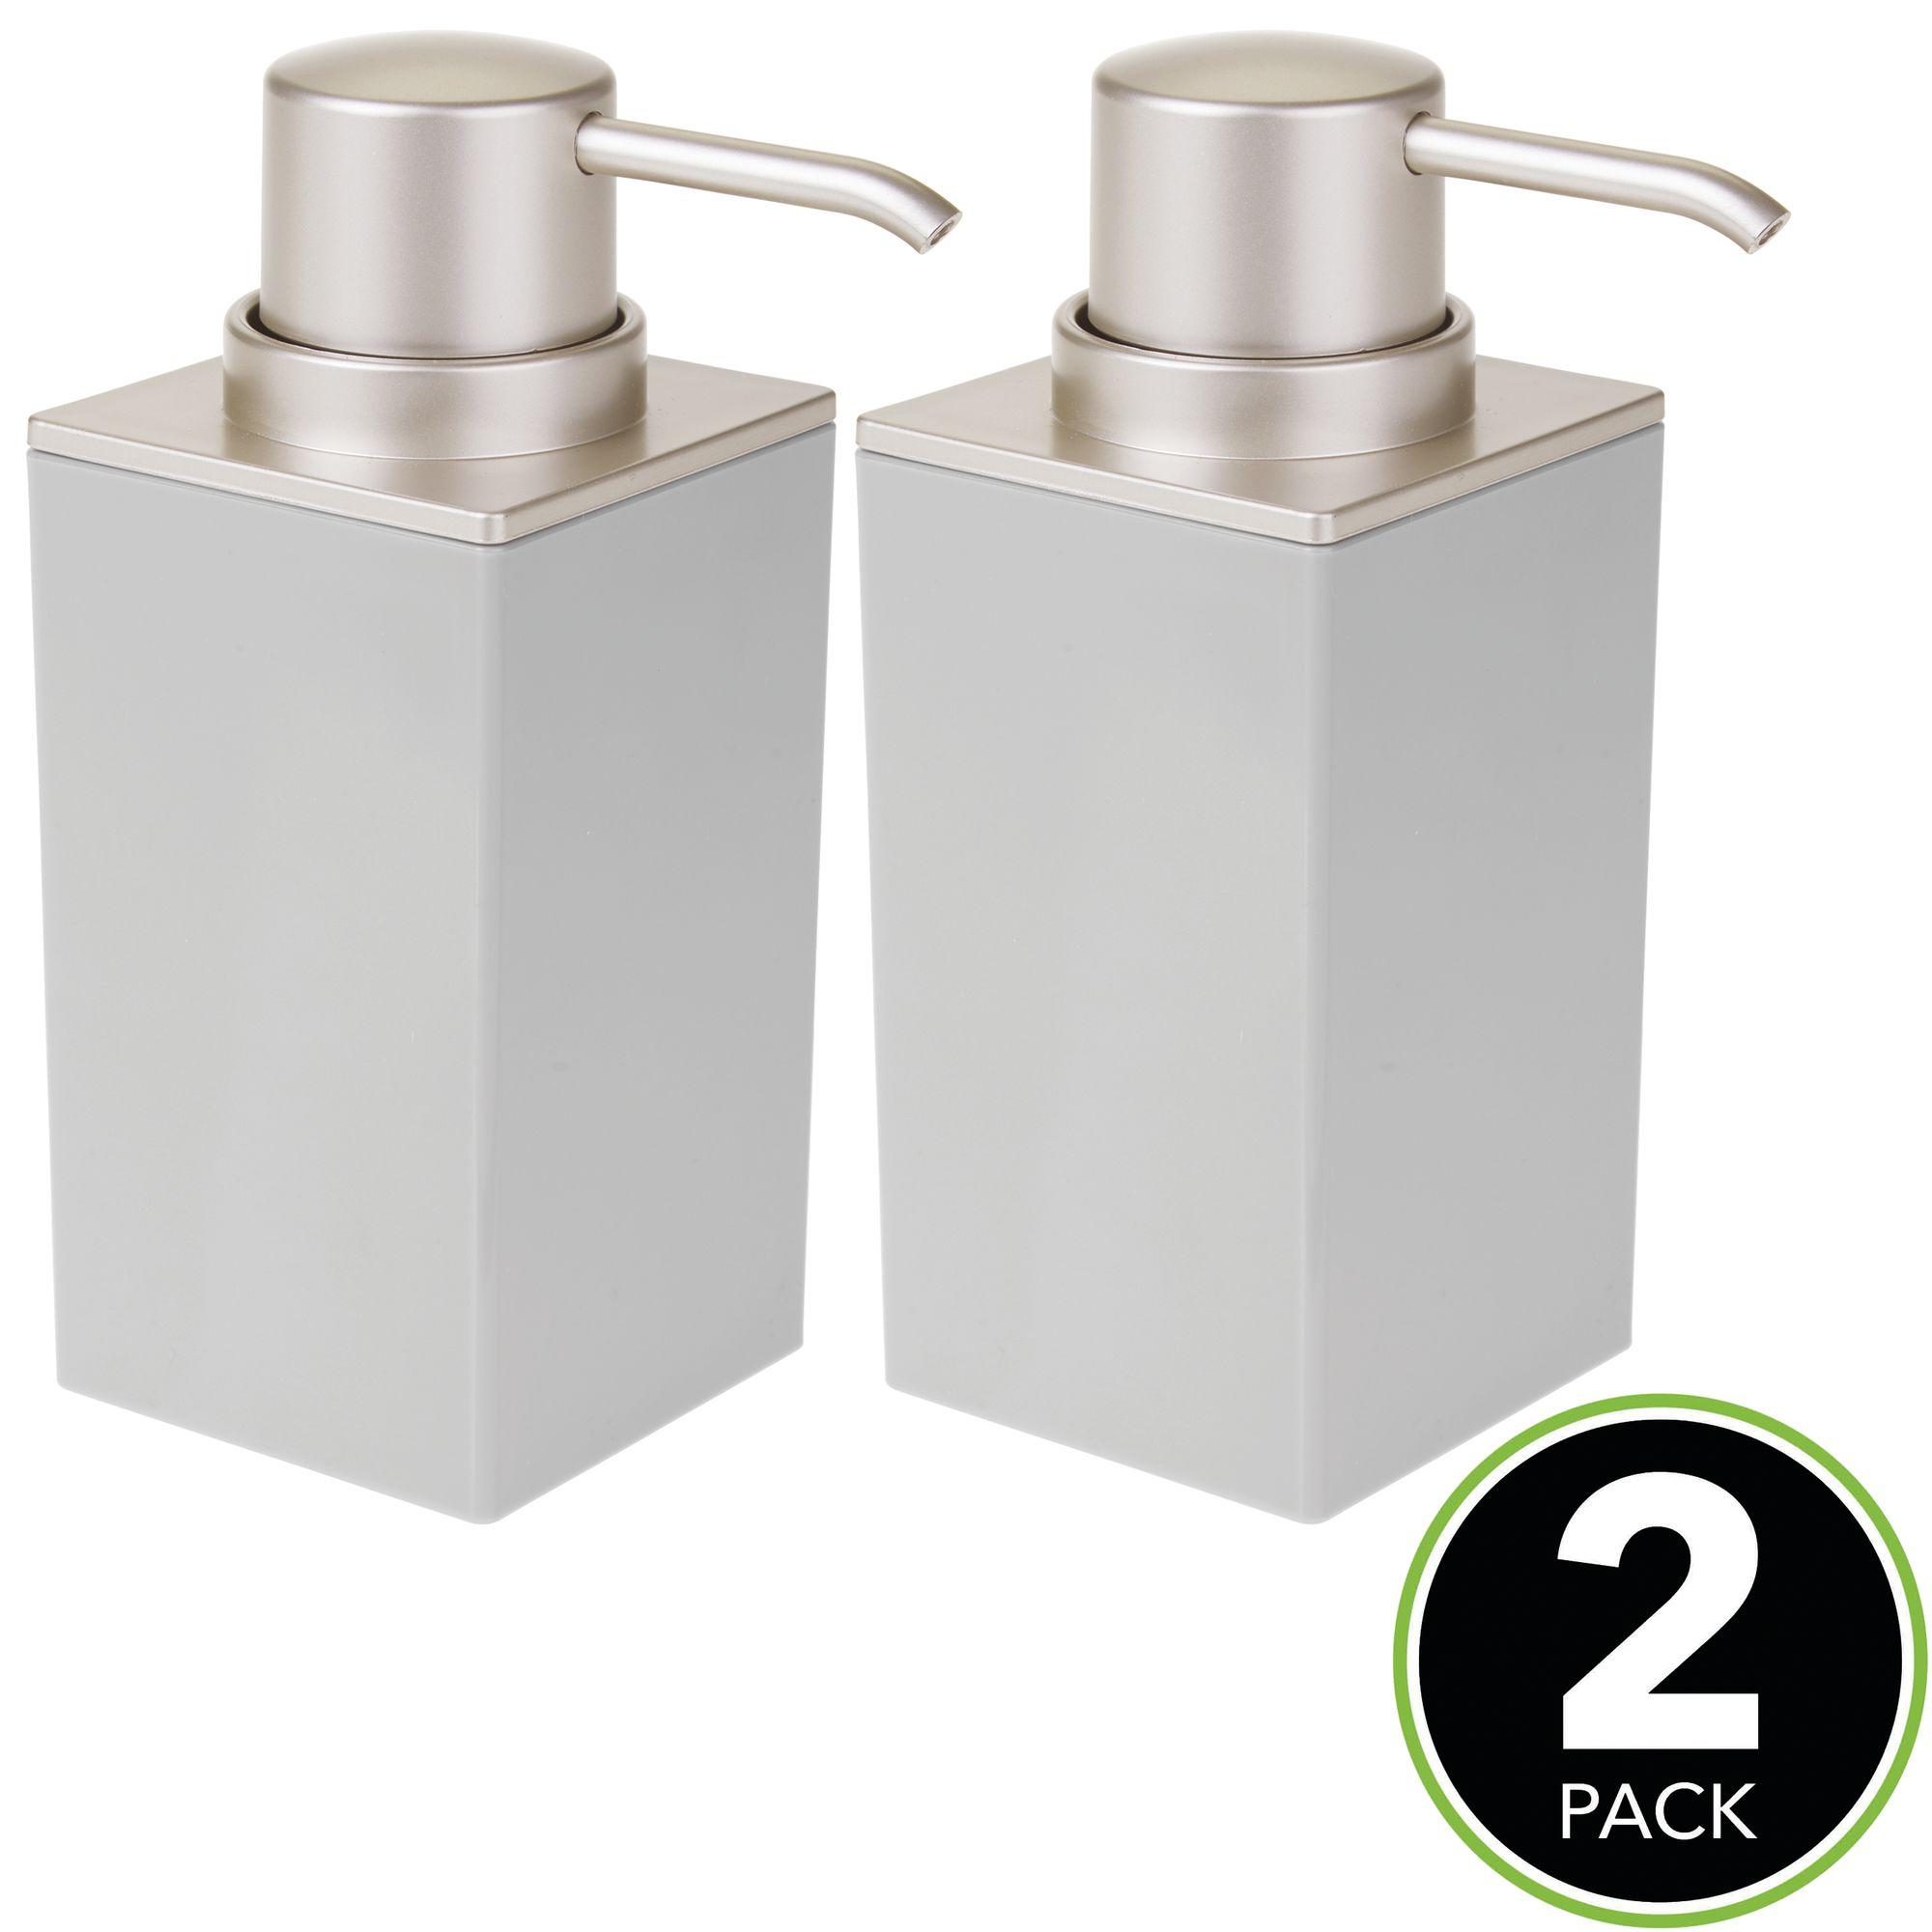 mDesign Square Plastic Refillable Soap Dispenser Pump